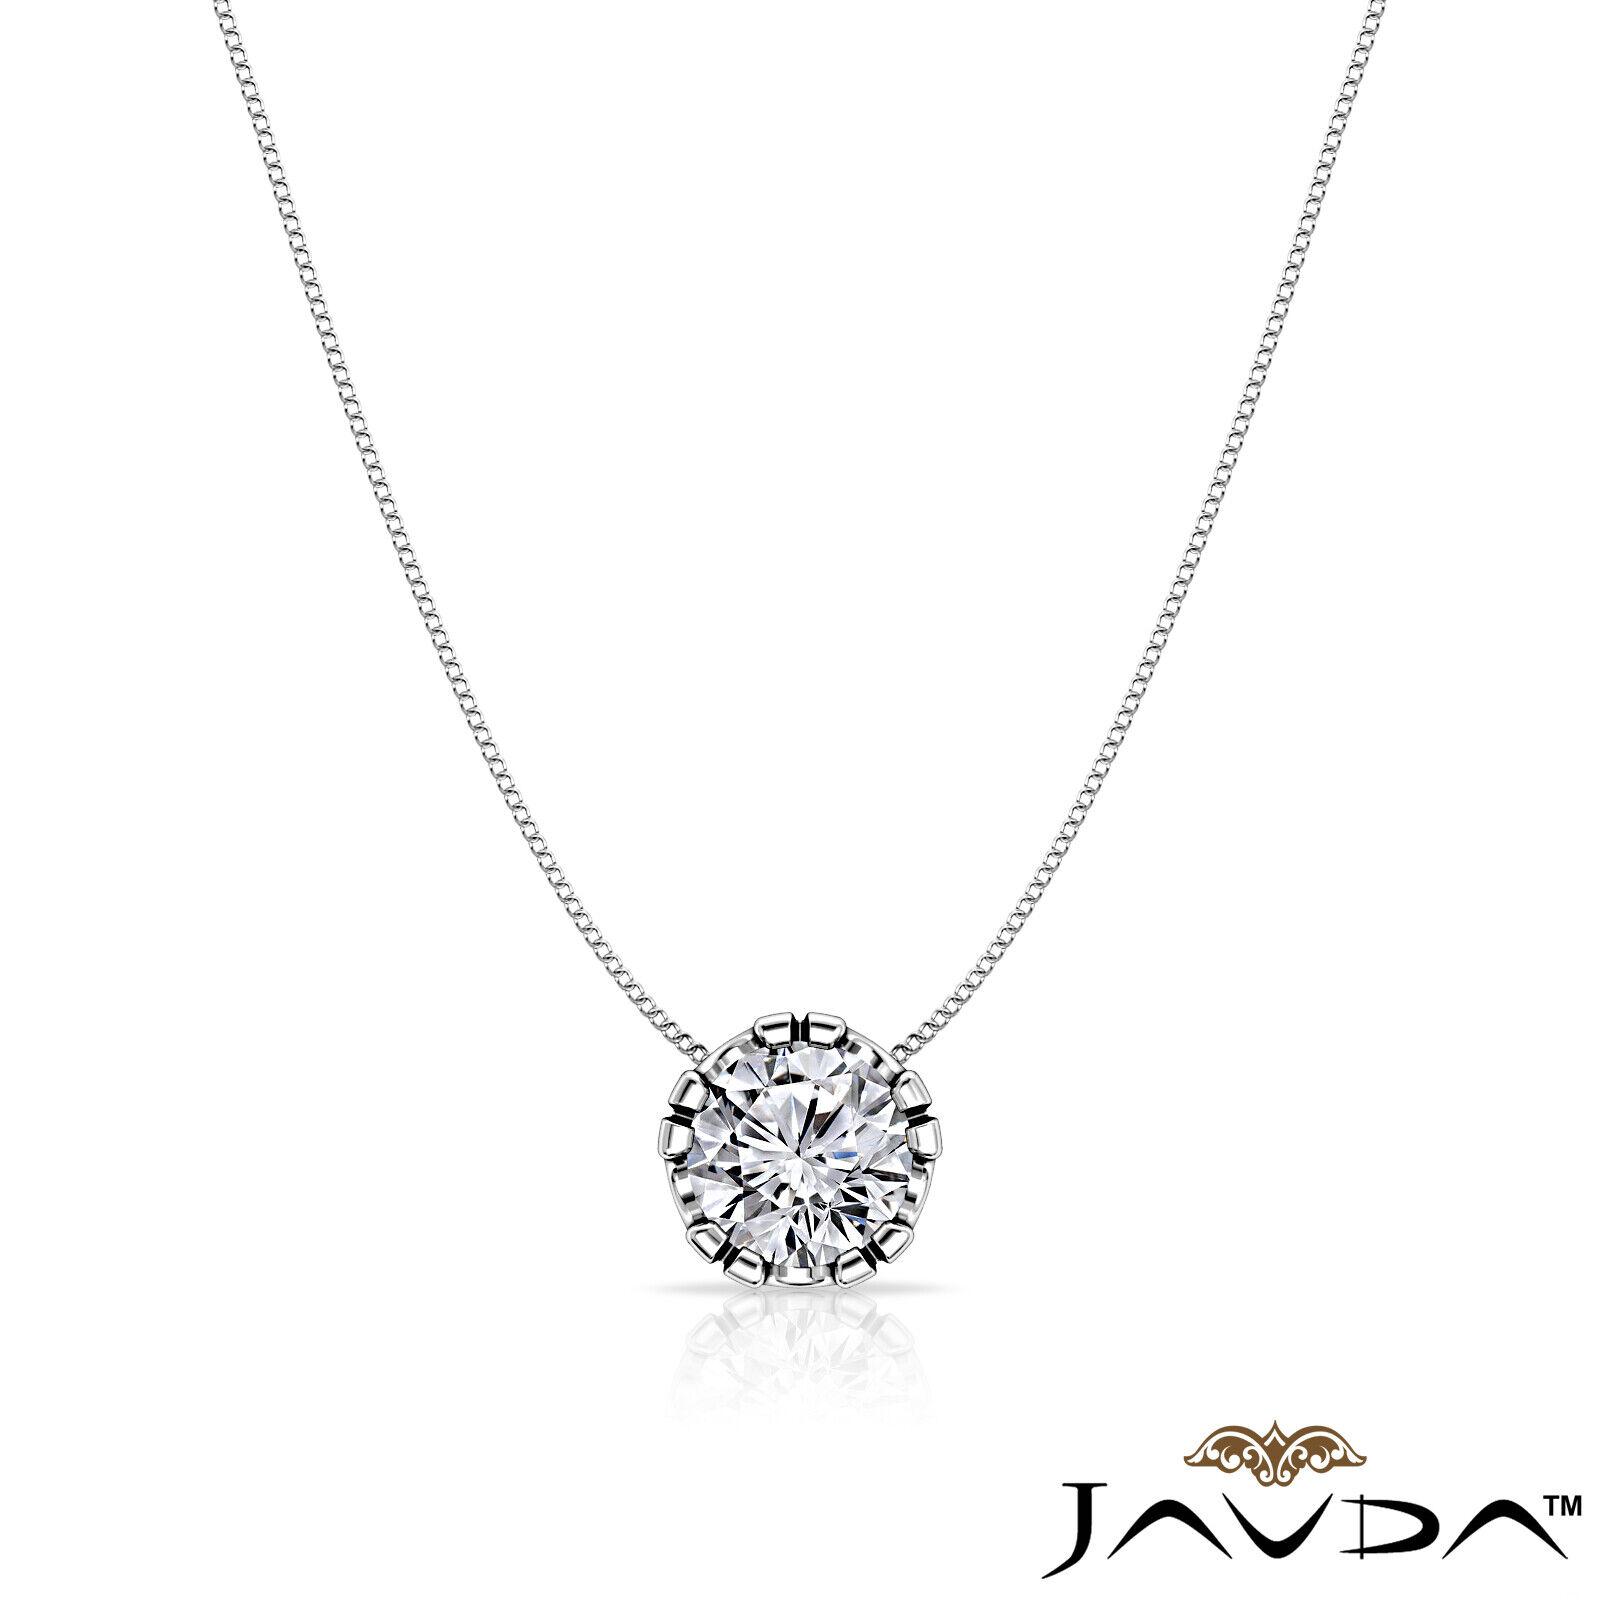 Solitaire Round Shape Diamond Double Prong Pendant 18 Inch Rolo Chain 0.26 ctw. 2